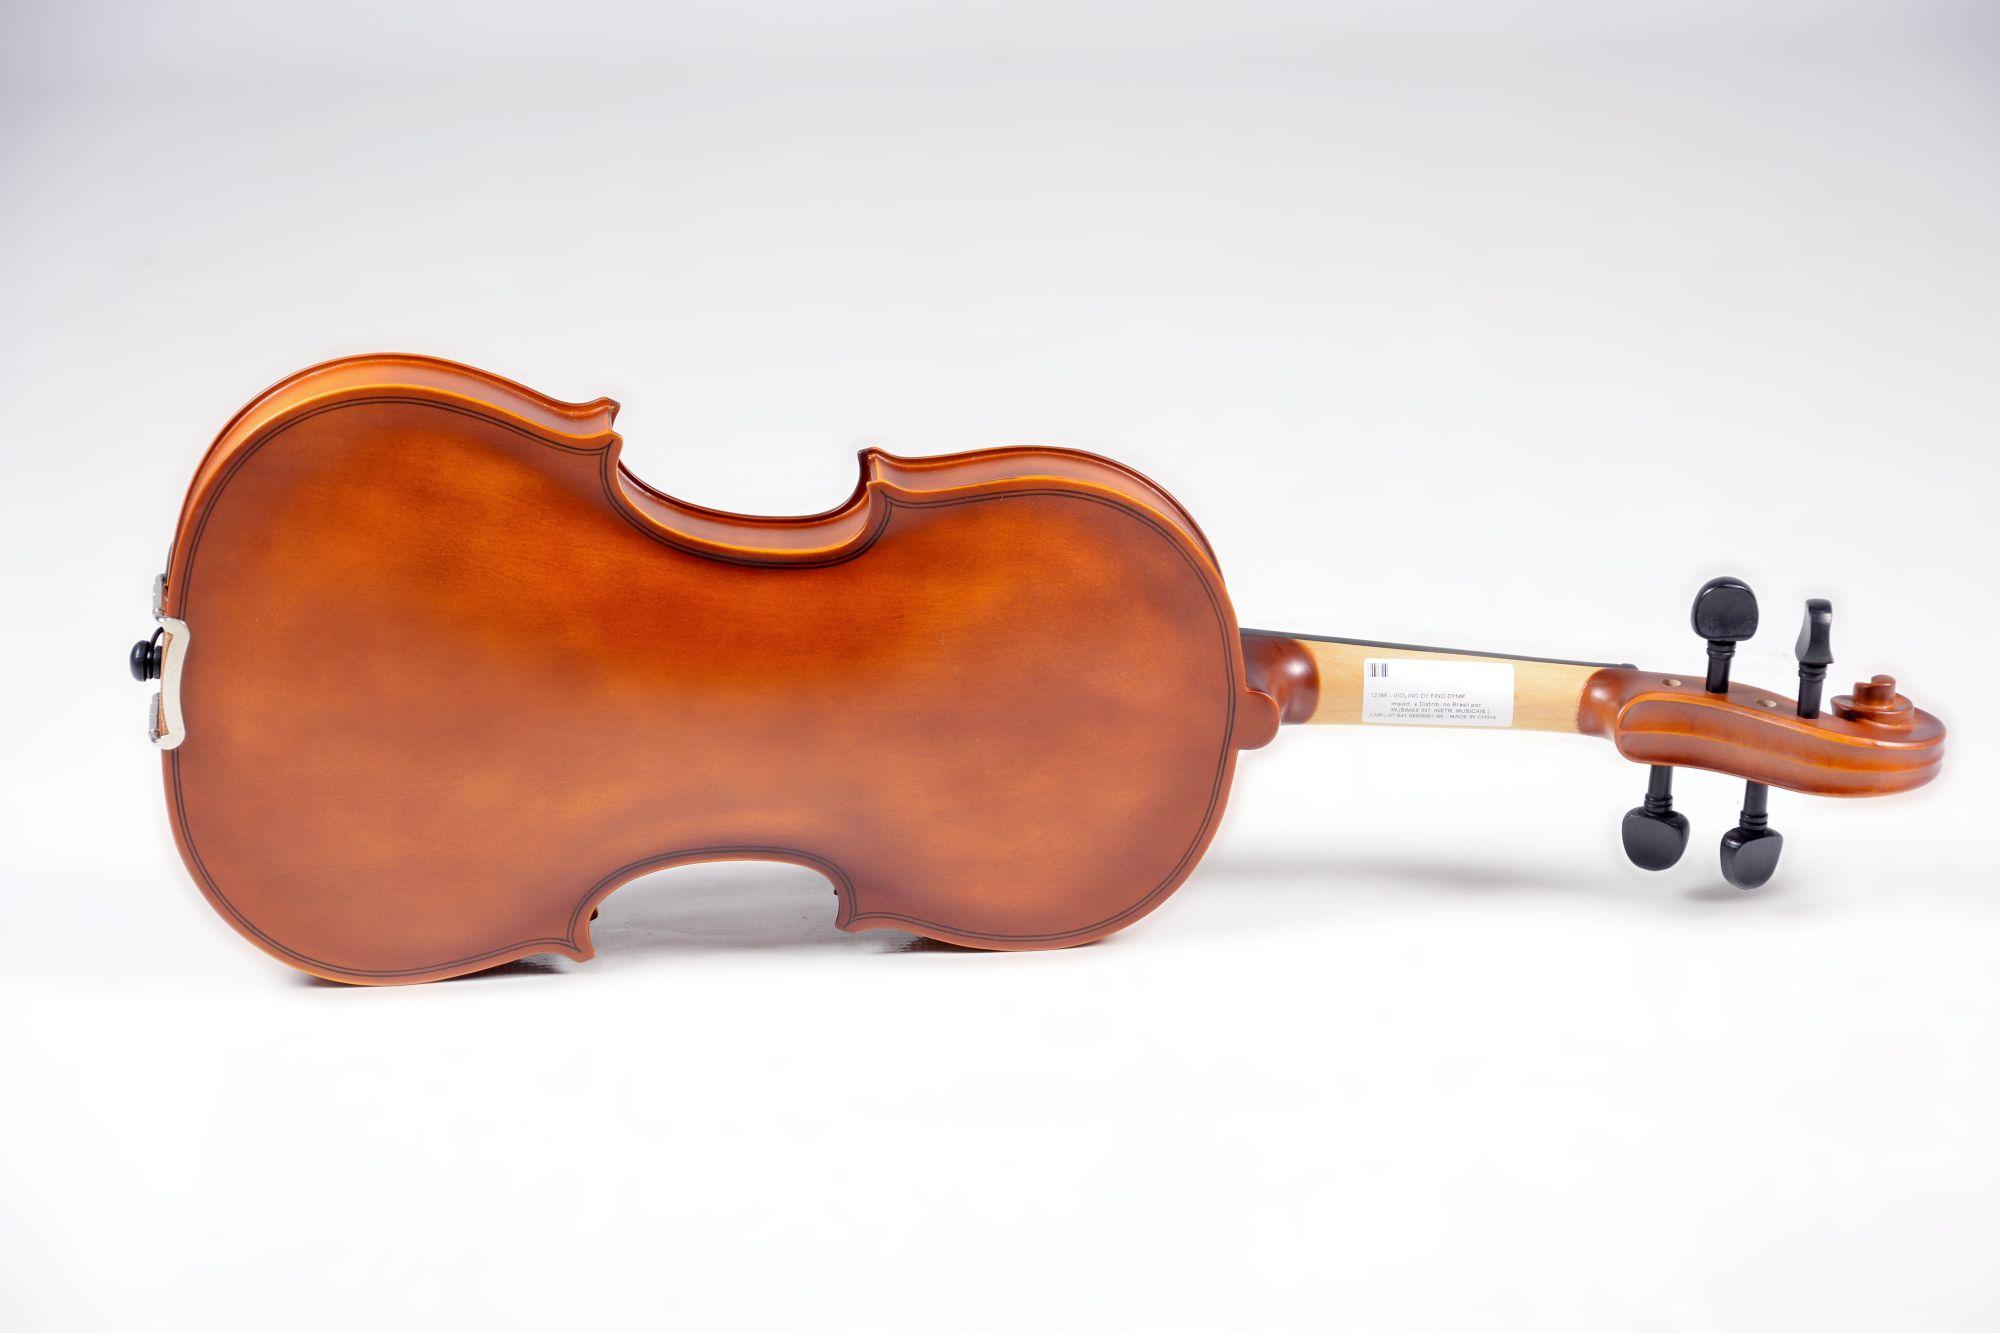 Violino Vivace Mo44s Mozart 4/4 Fosco